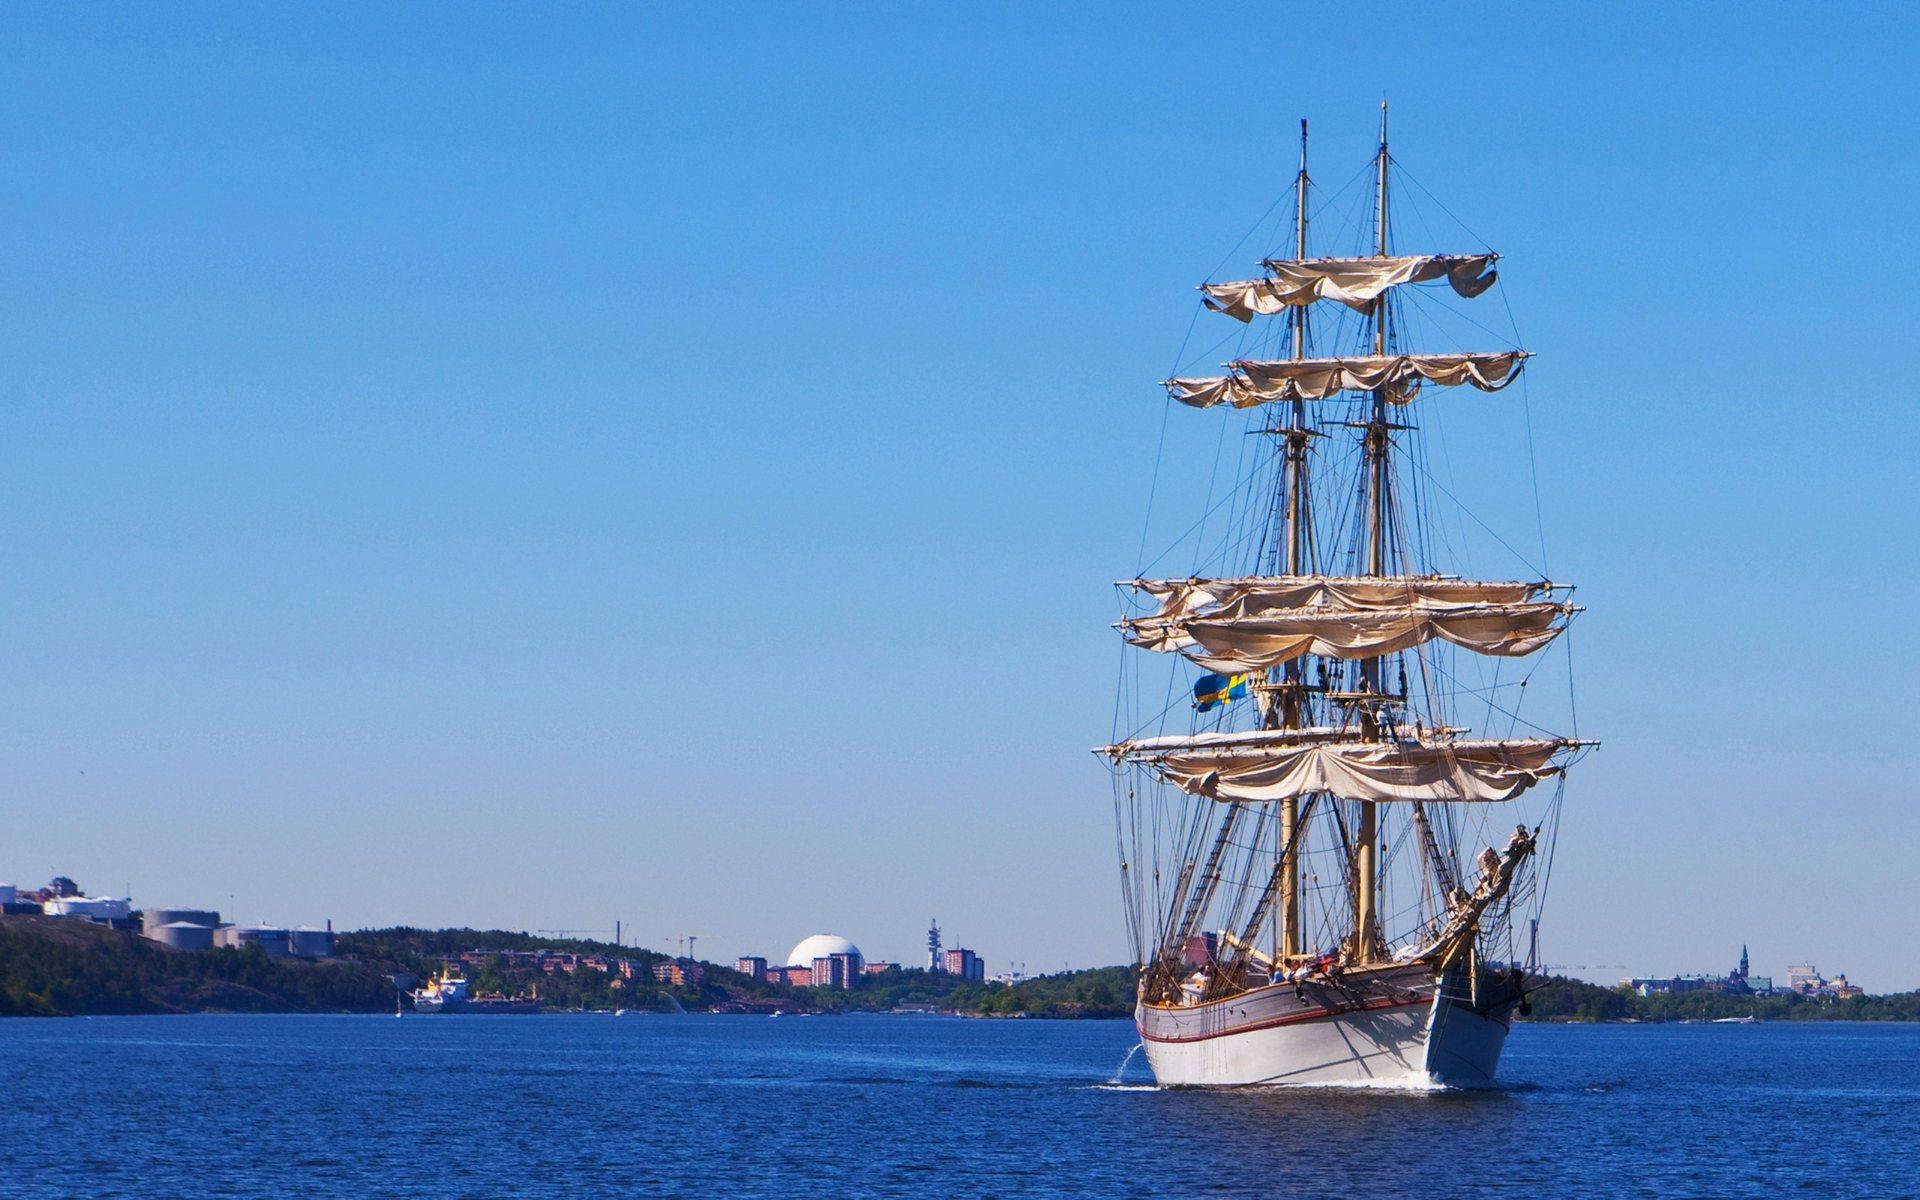 sailboat wallpaper background